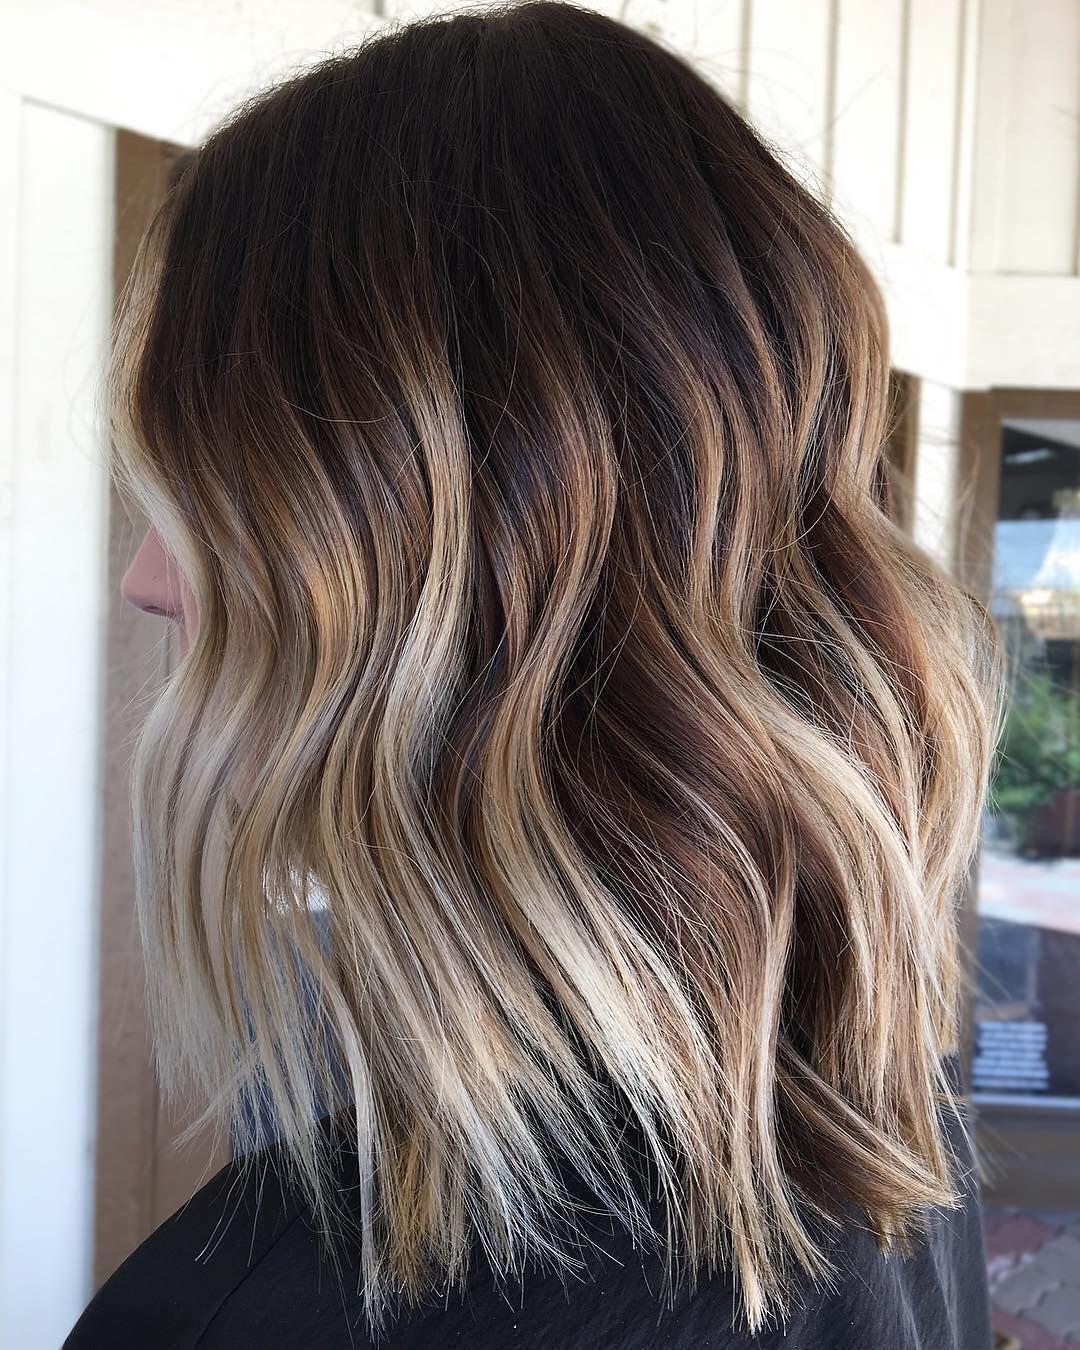 Best Brown Balayage Hair Designs For Medium Length Hair Medium Hairstyle Color Hair Styles Balayage Brunette Balayage Hair